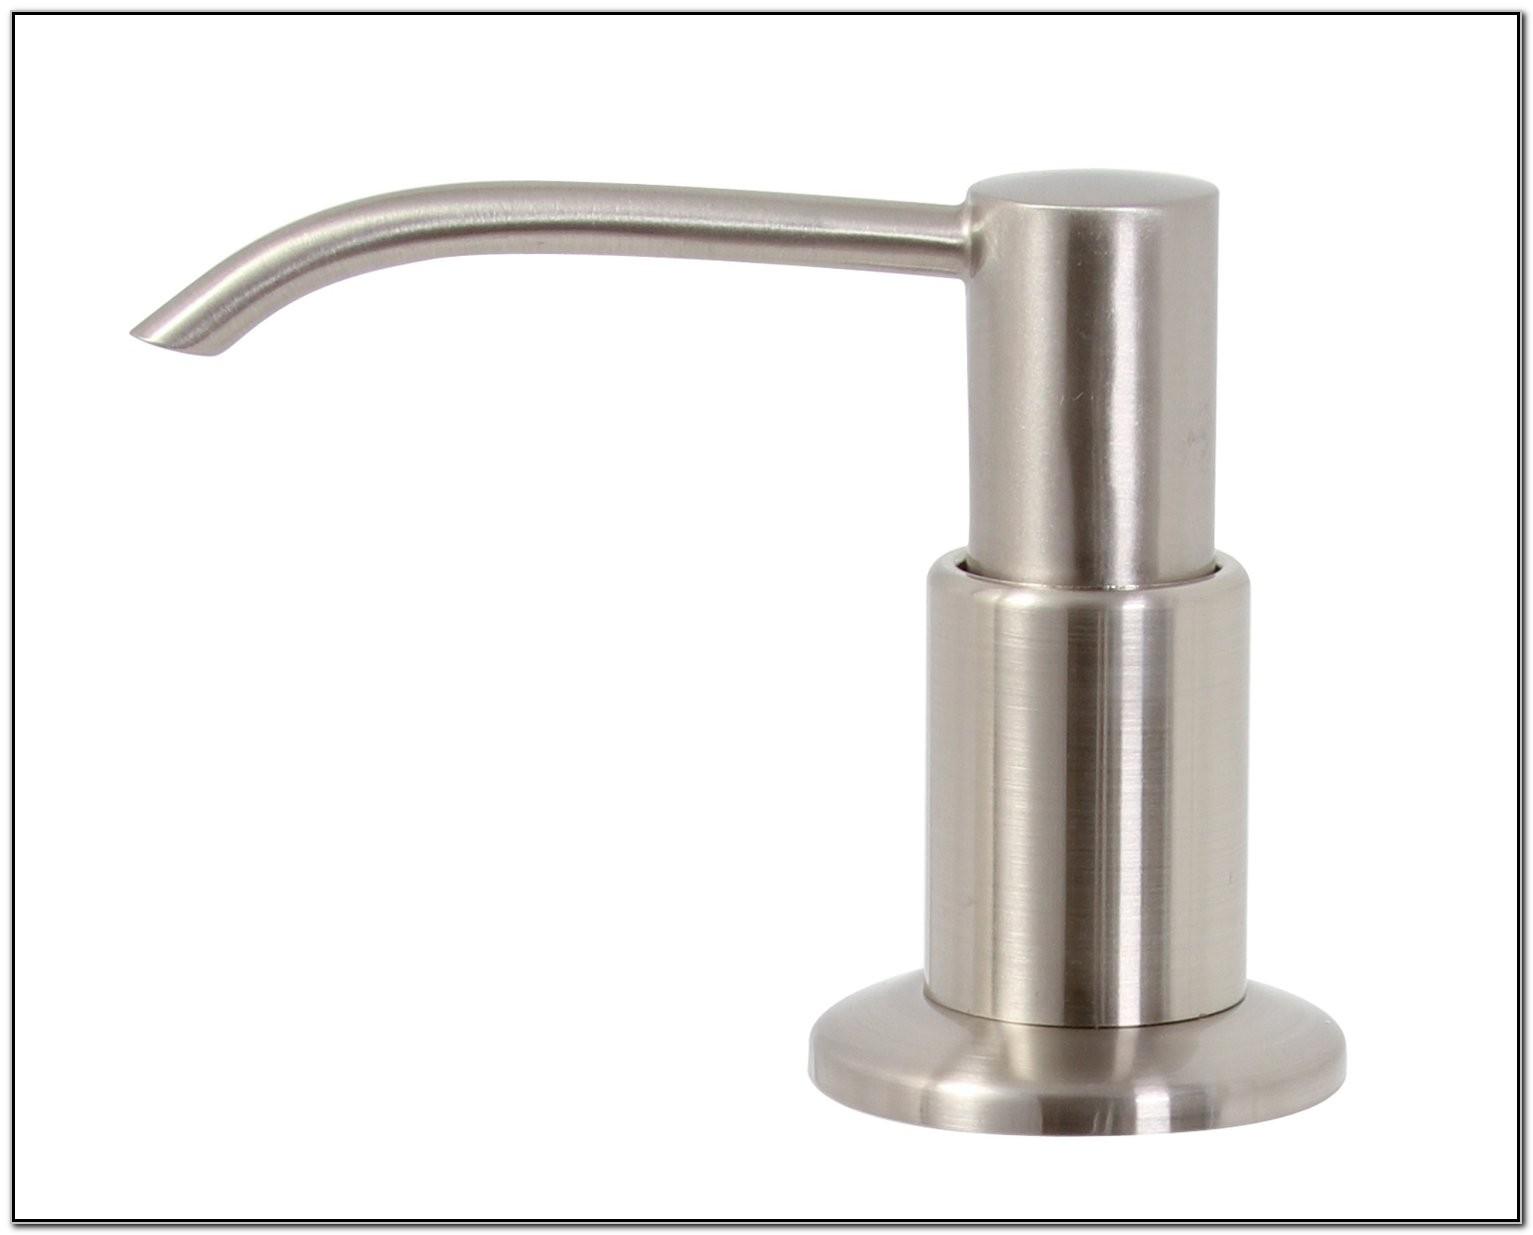 Soap Dispenser For Sink